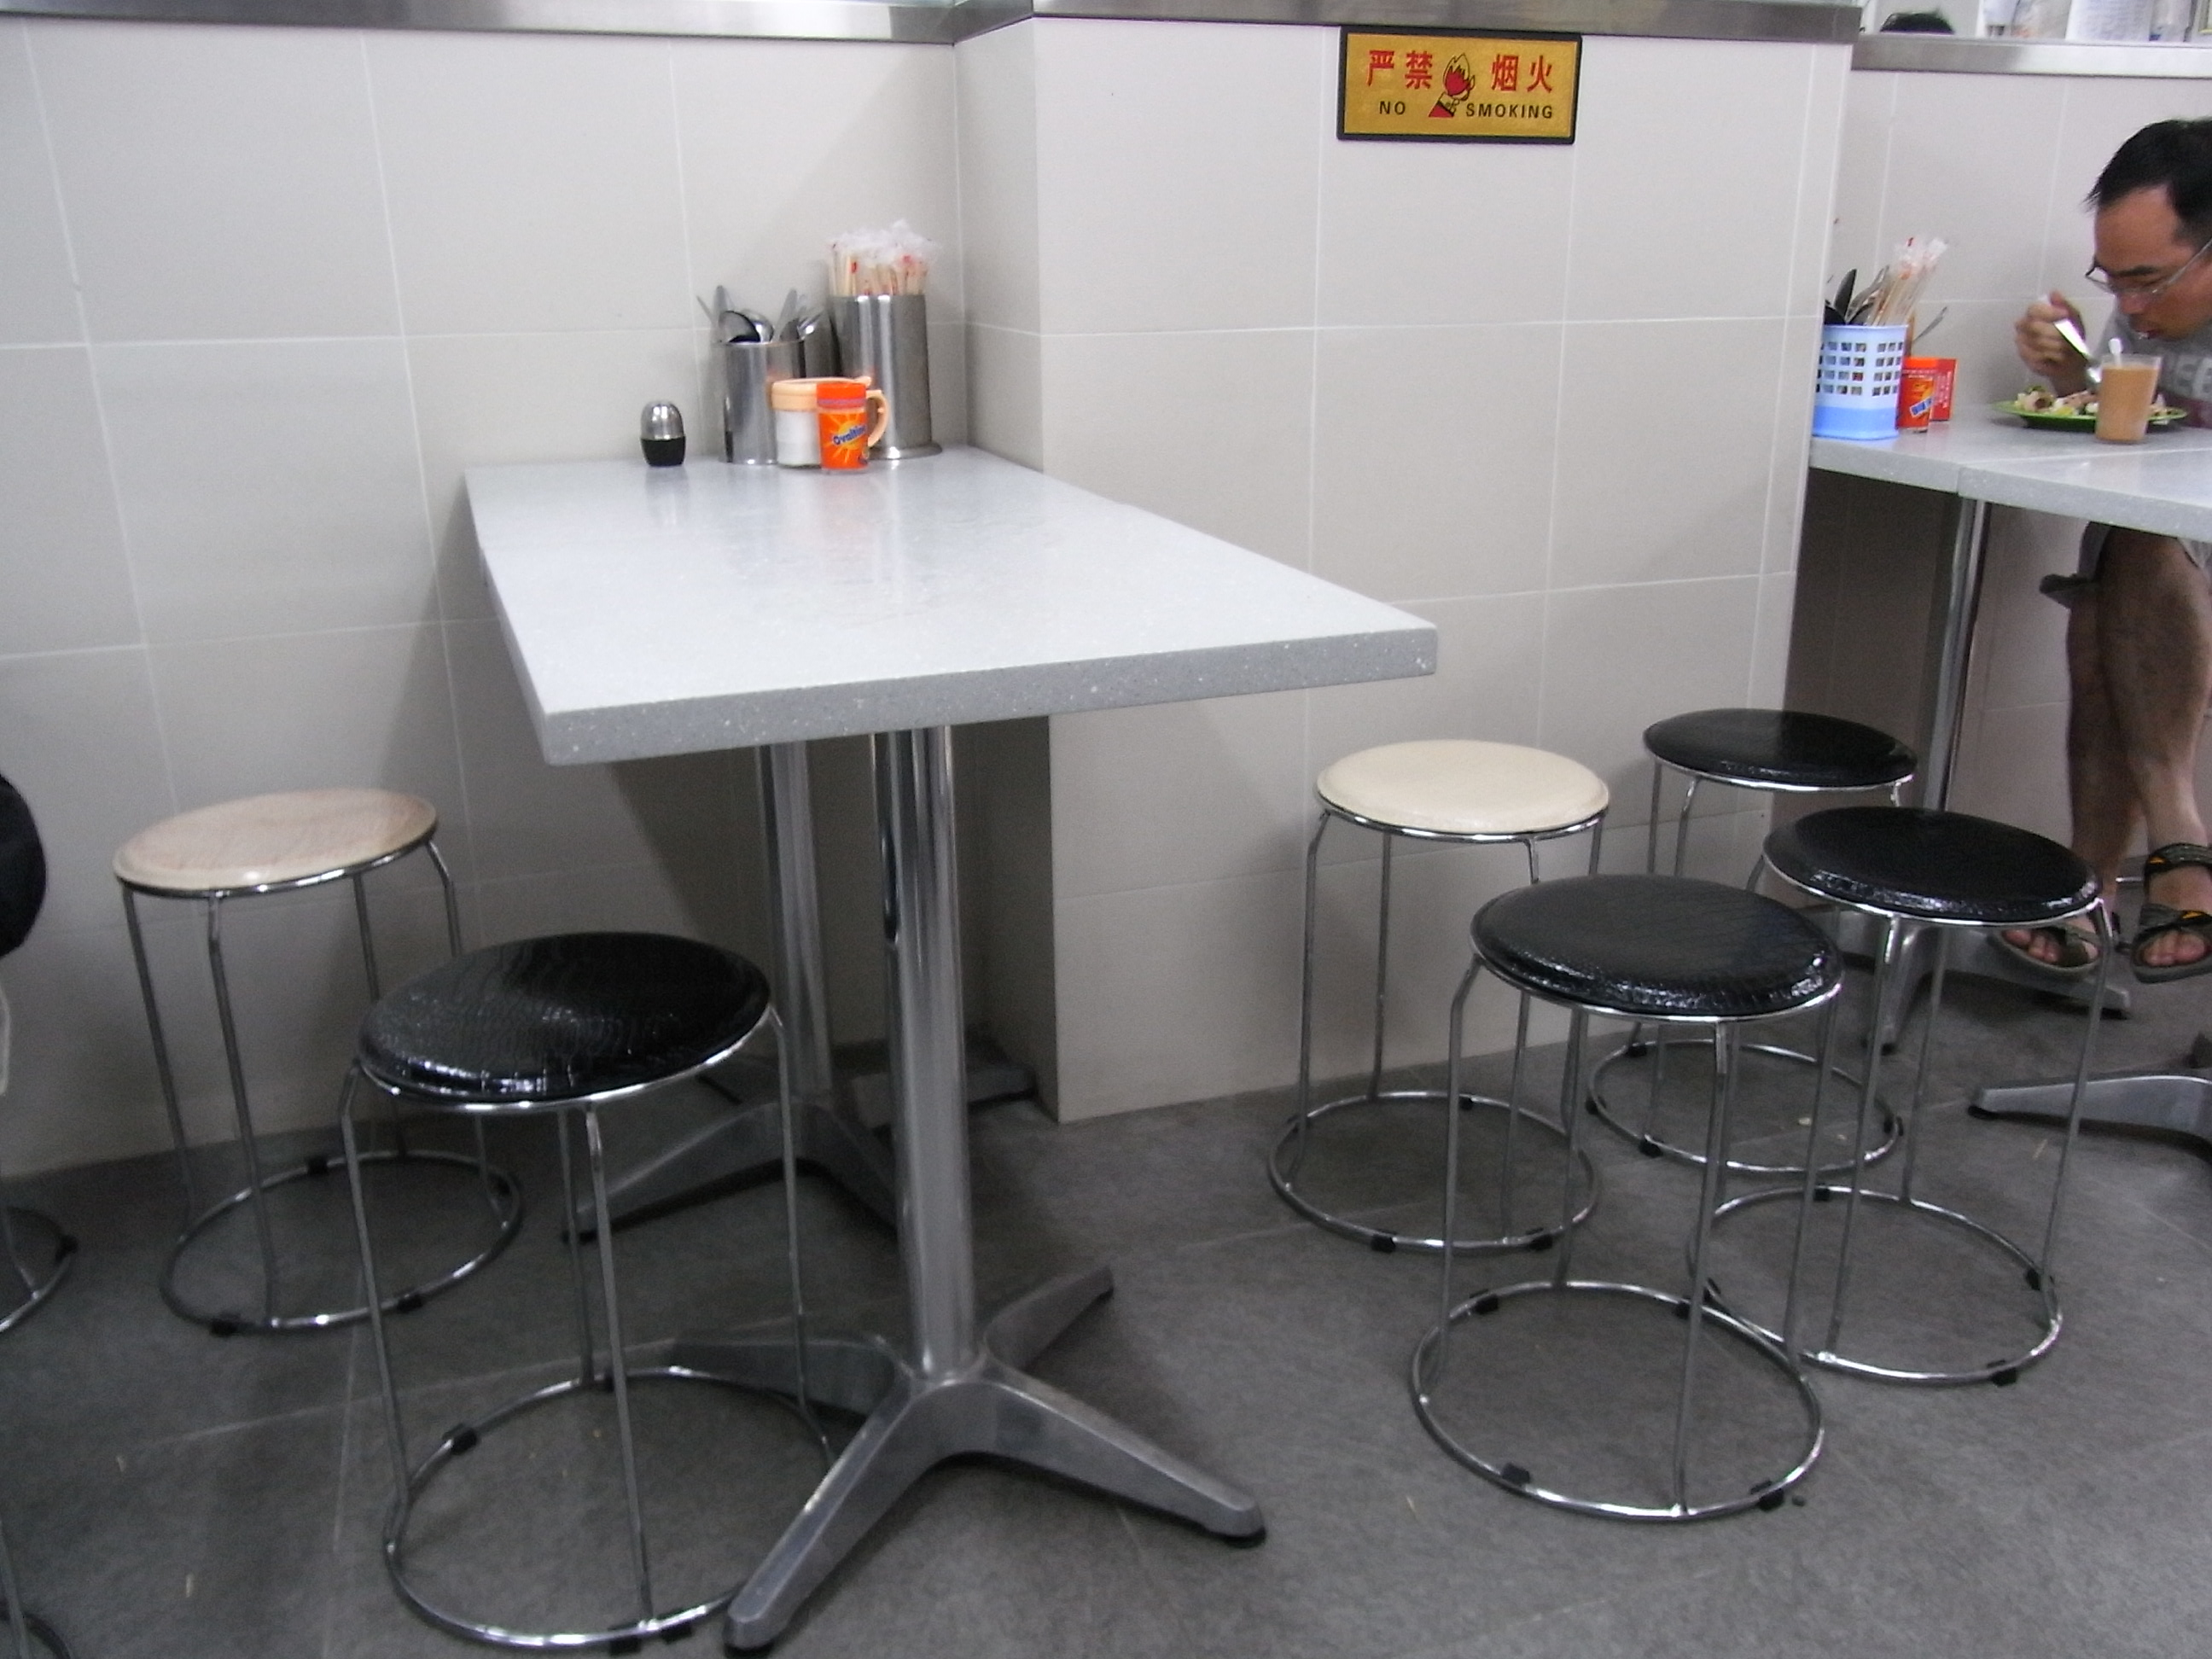 fast table chair haworth zody price file hk sheung wan 金太陽 gold sun good food 01 n